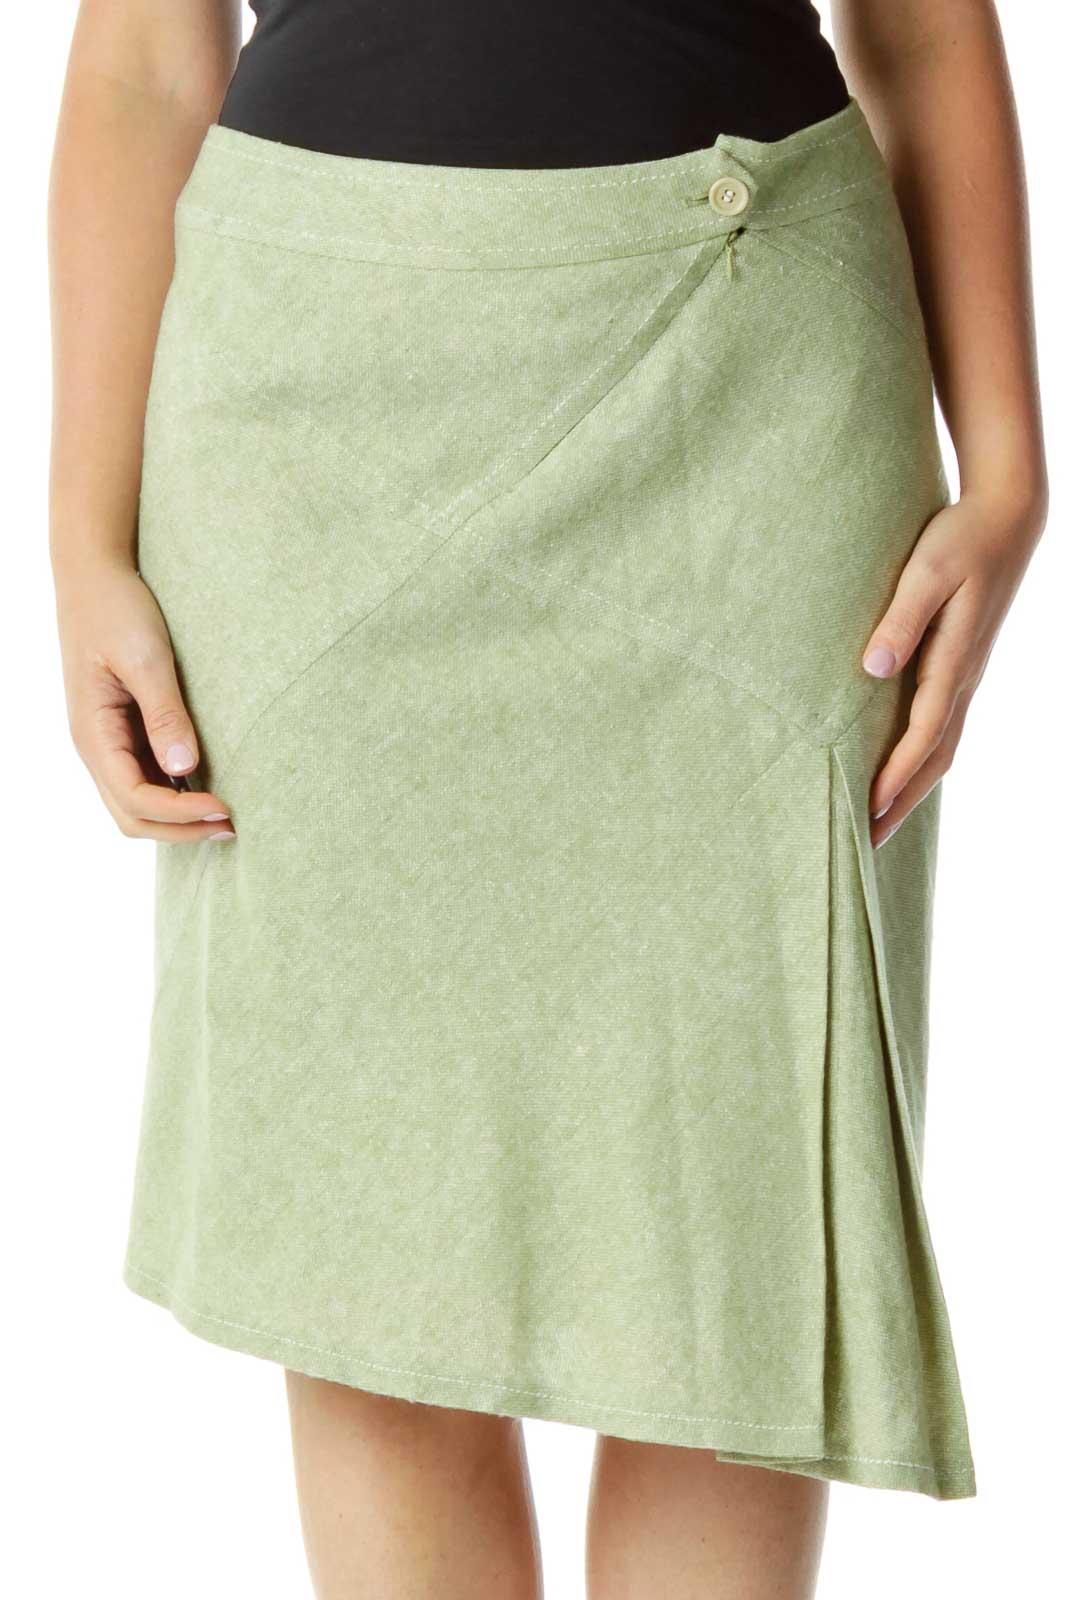 Green Woven A-Line Skirt Front